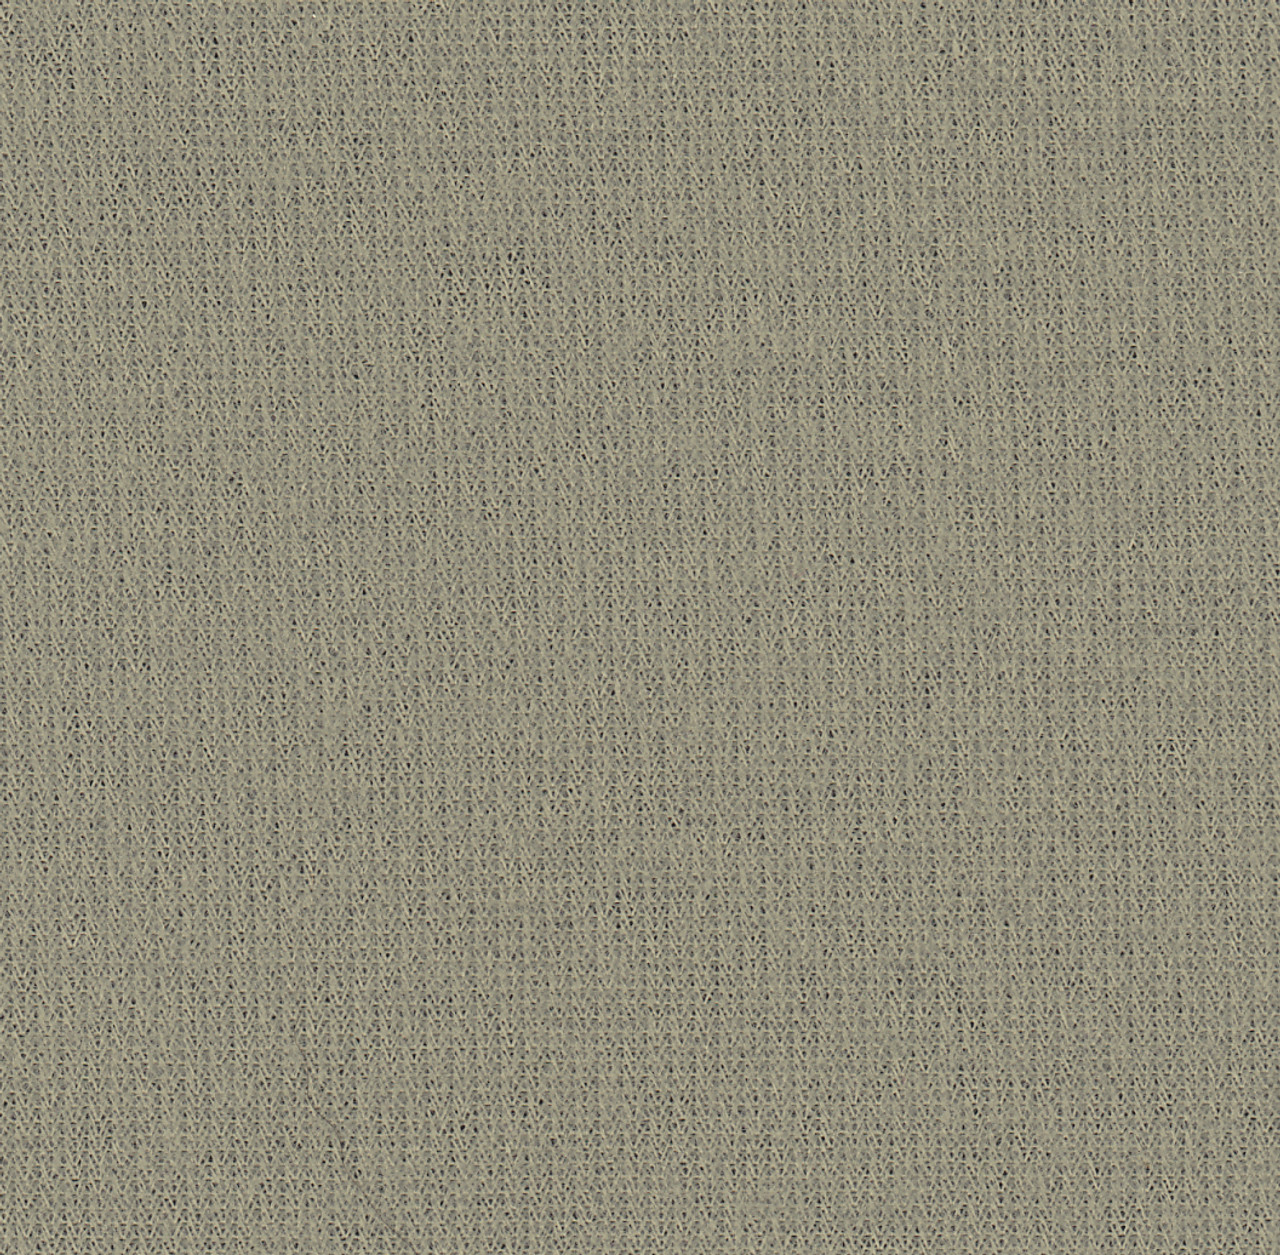 SunBrite SB-1784 Sand Grey